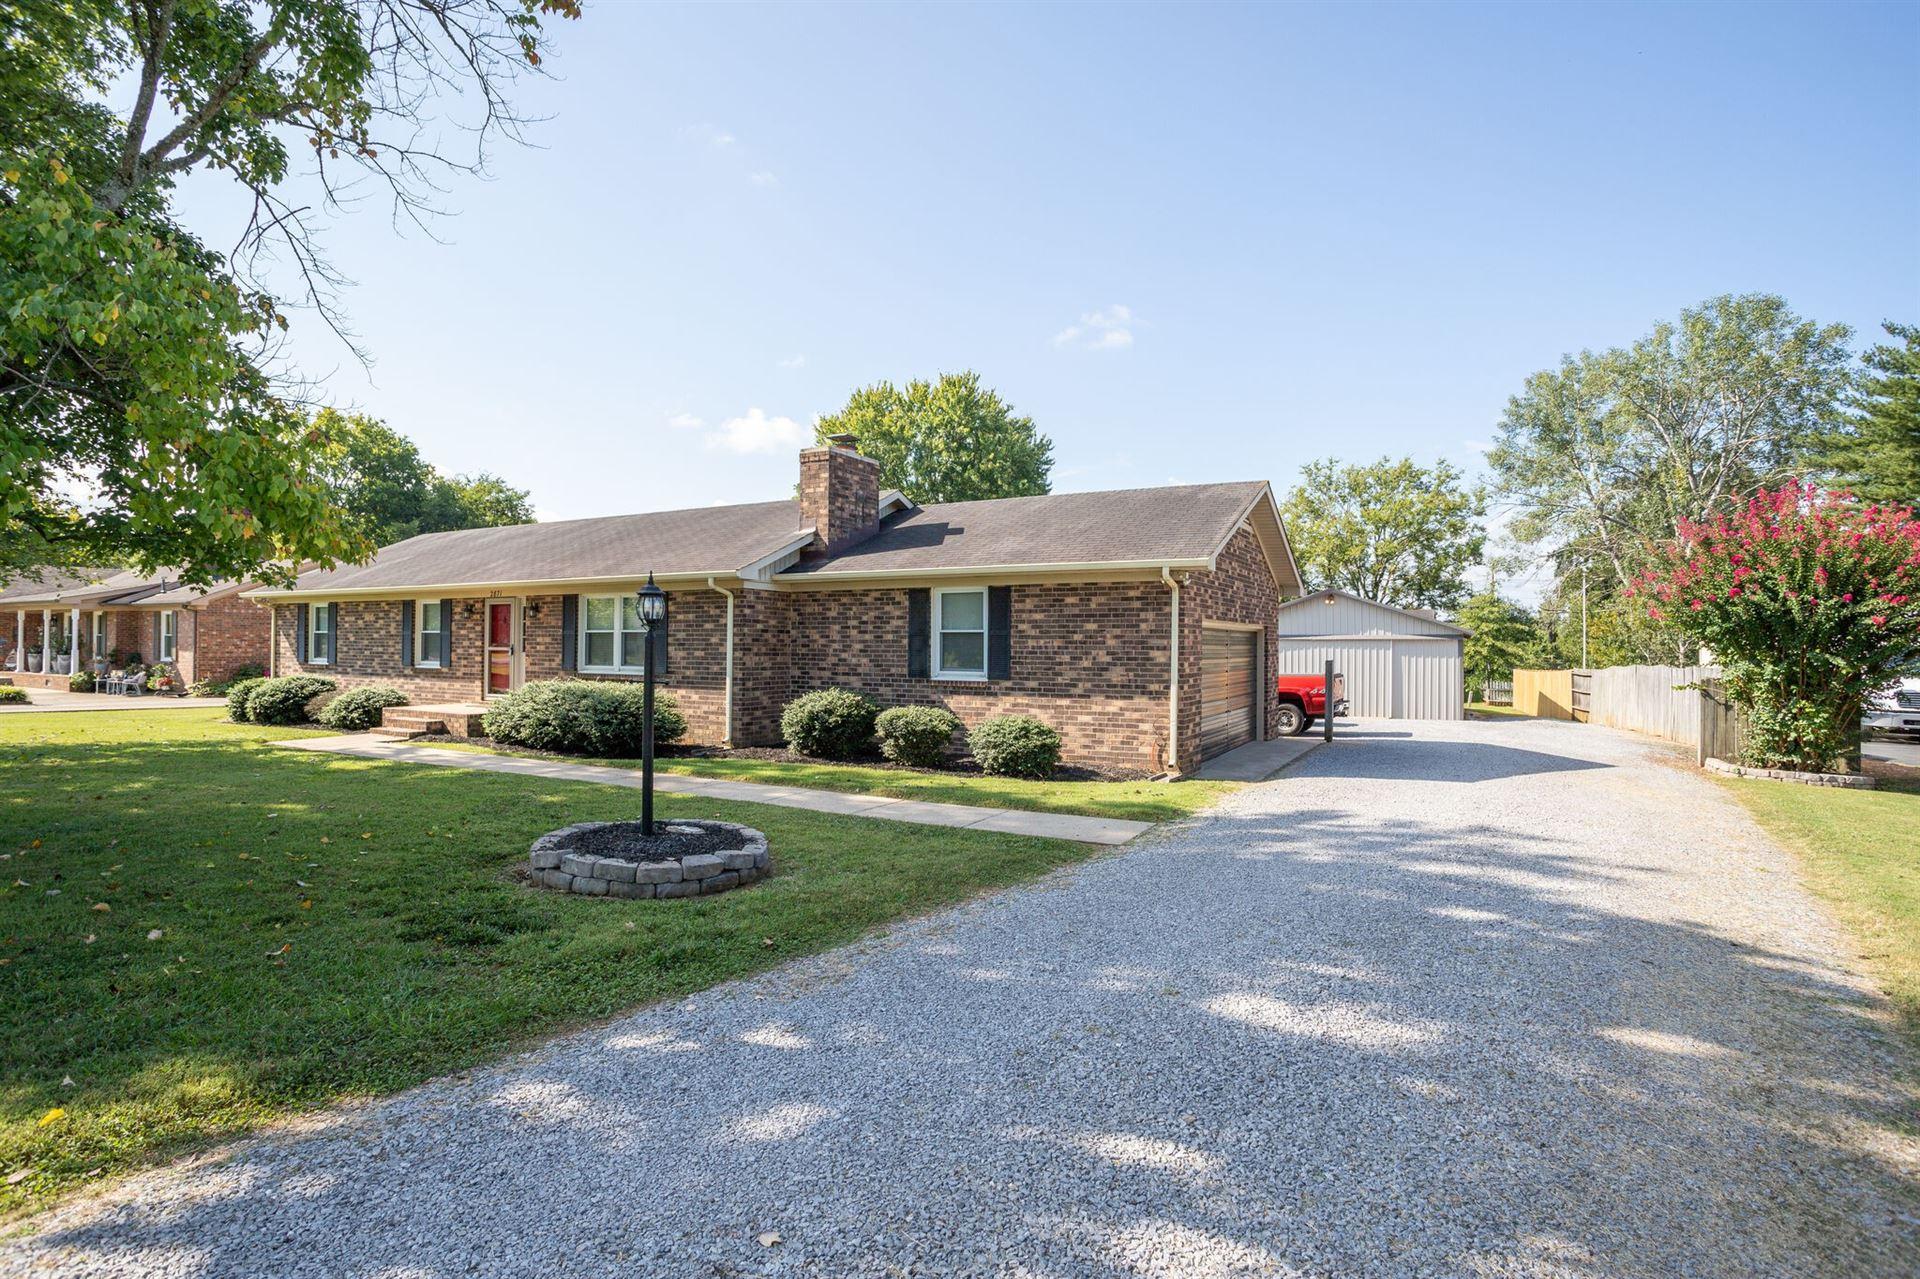 Photo of 2871 Bridle Dr, Murfreesboro, TN 37129 (MLS # 2291328)